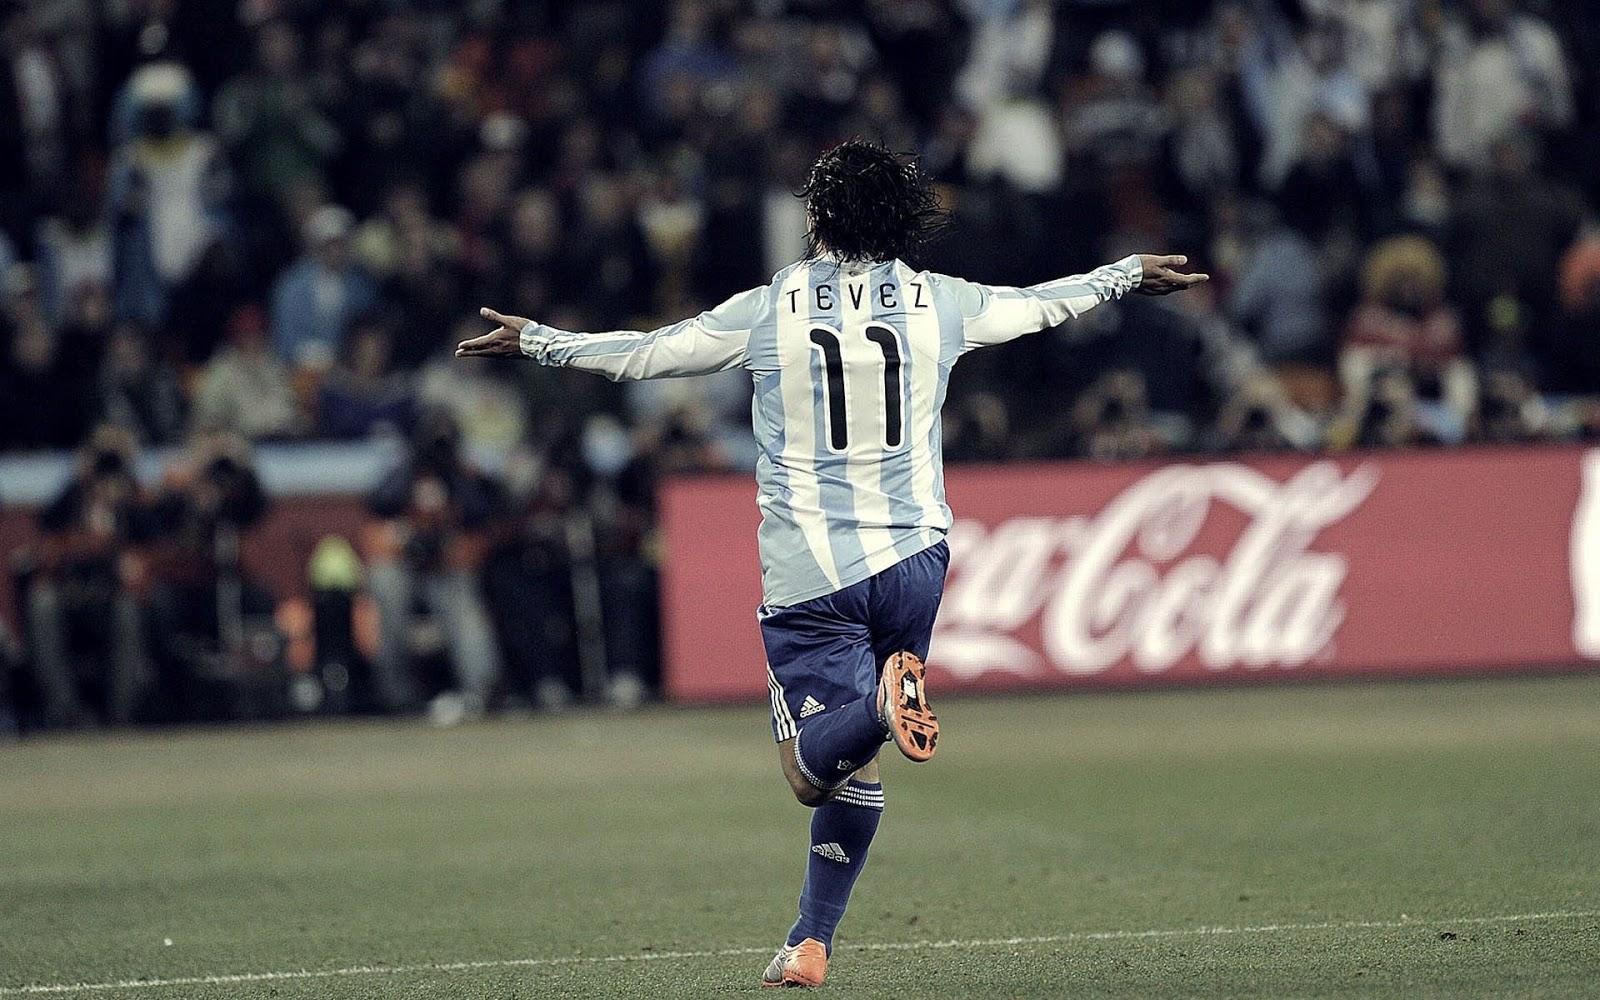 Carlos Tevez Soccer Player